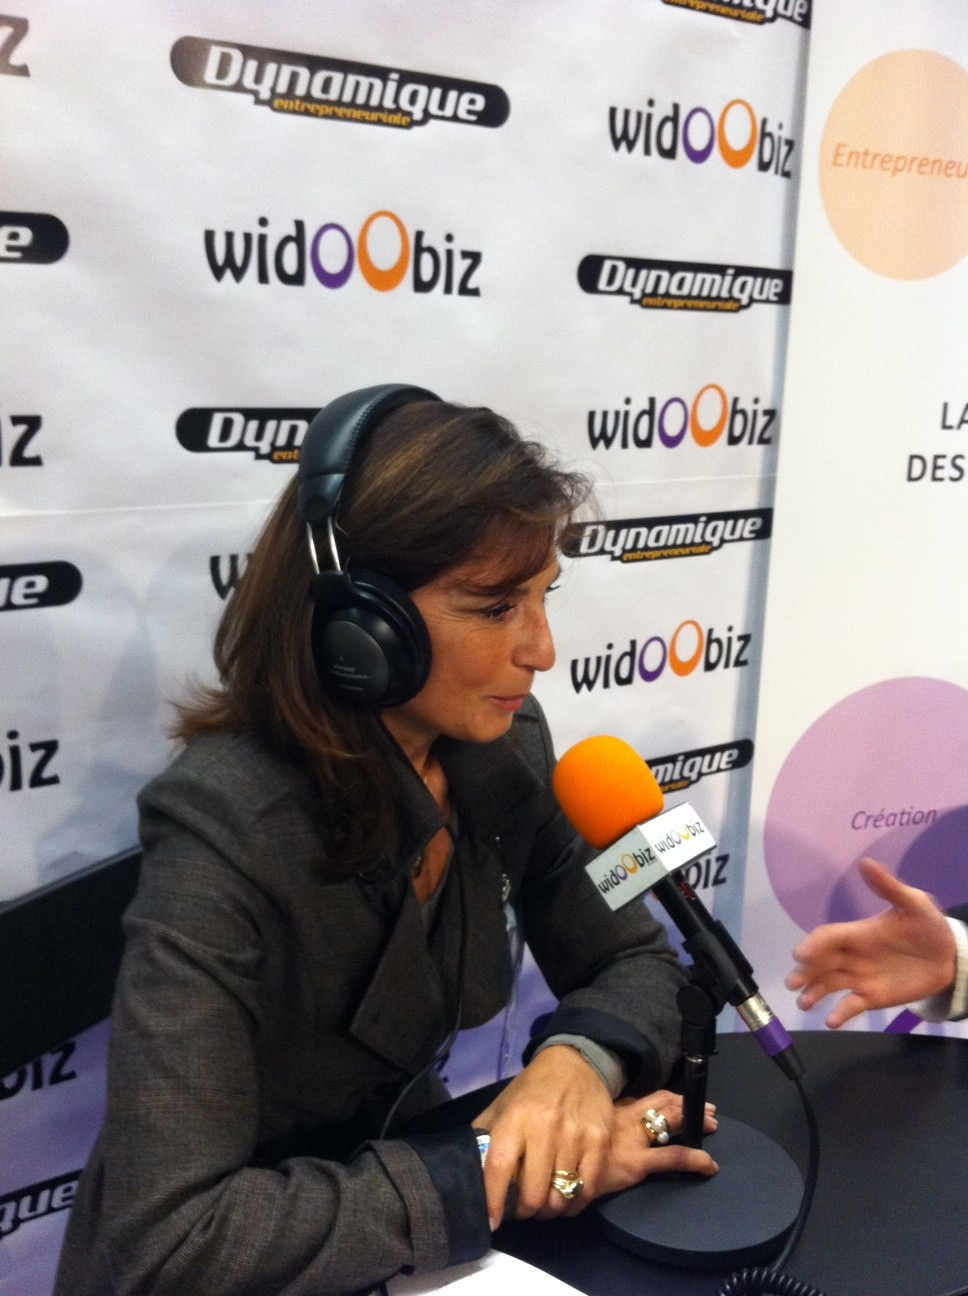 Fca widoobiz for Salon des entrepreneurs 2016